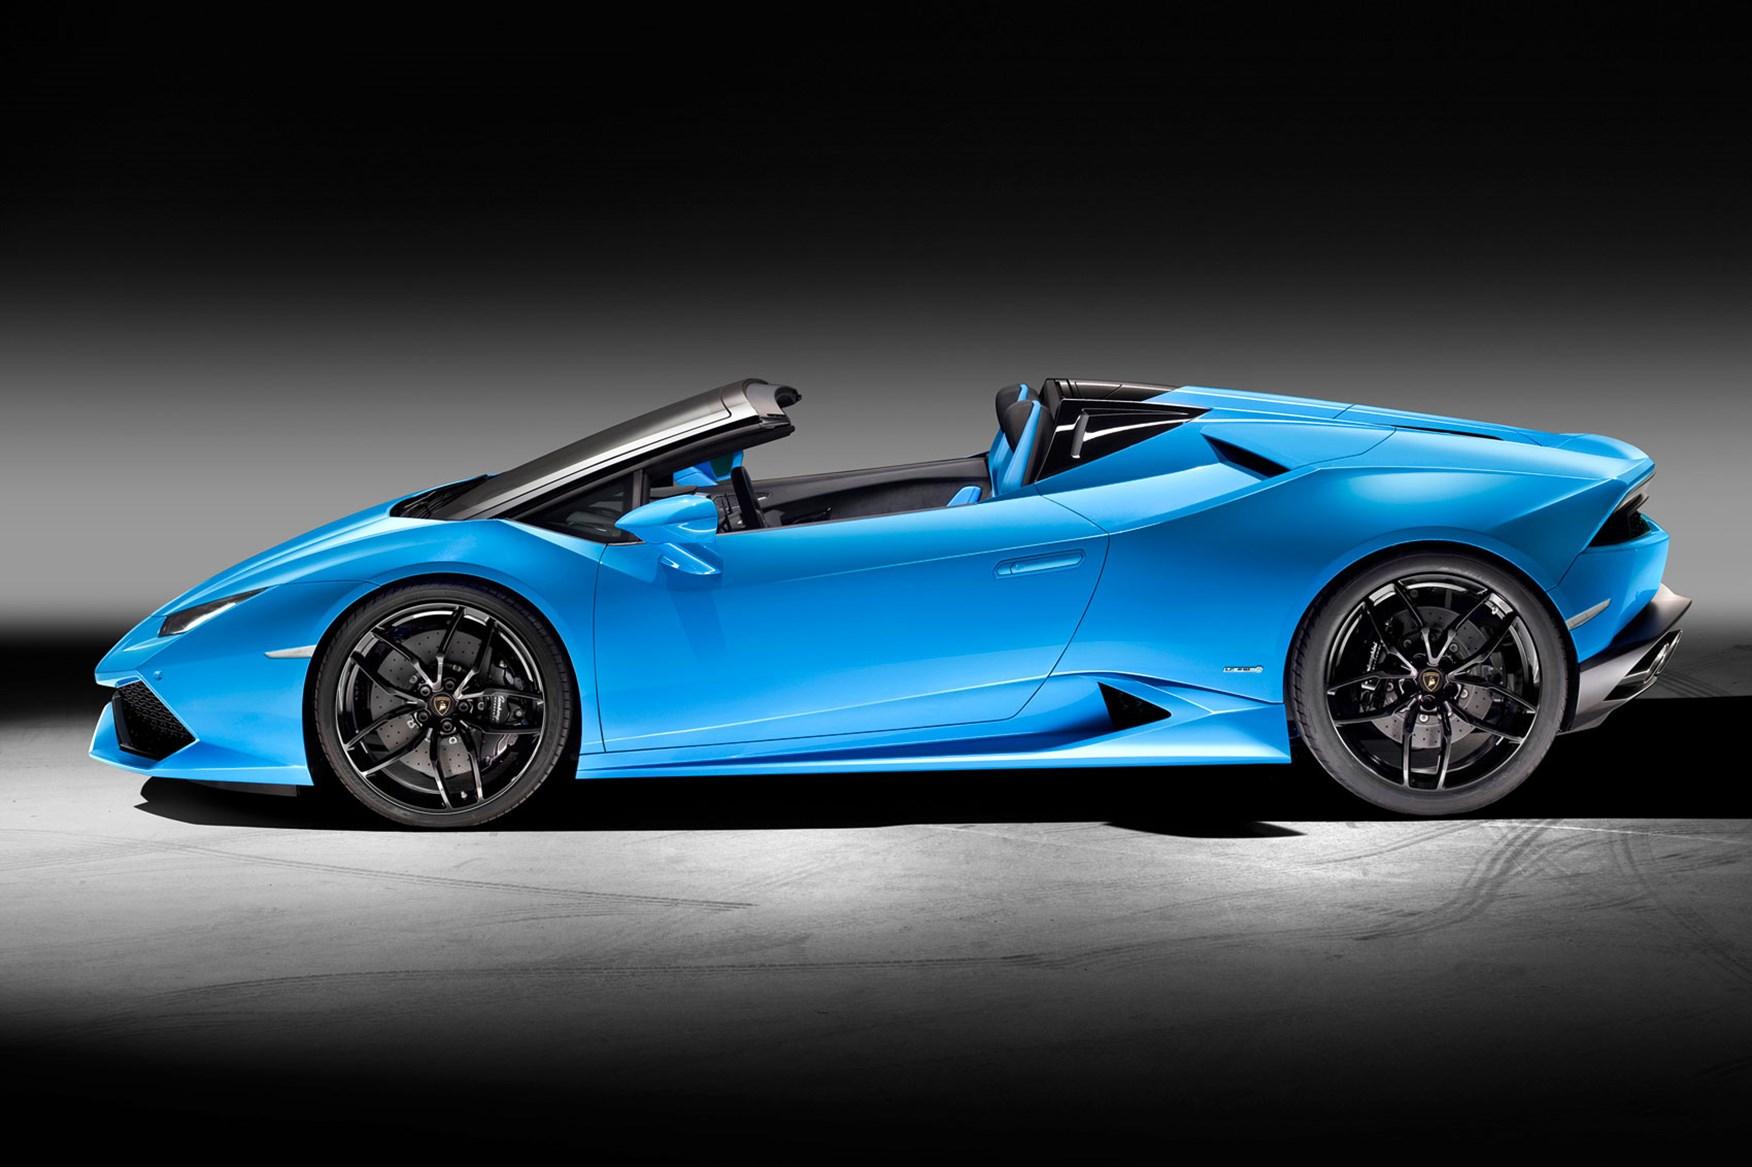 Lamborghini Huracan Lp 610 4 Spyder 2015 The Huracan